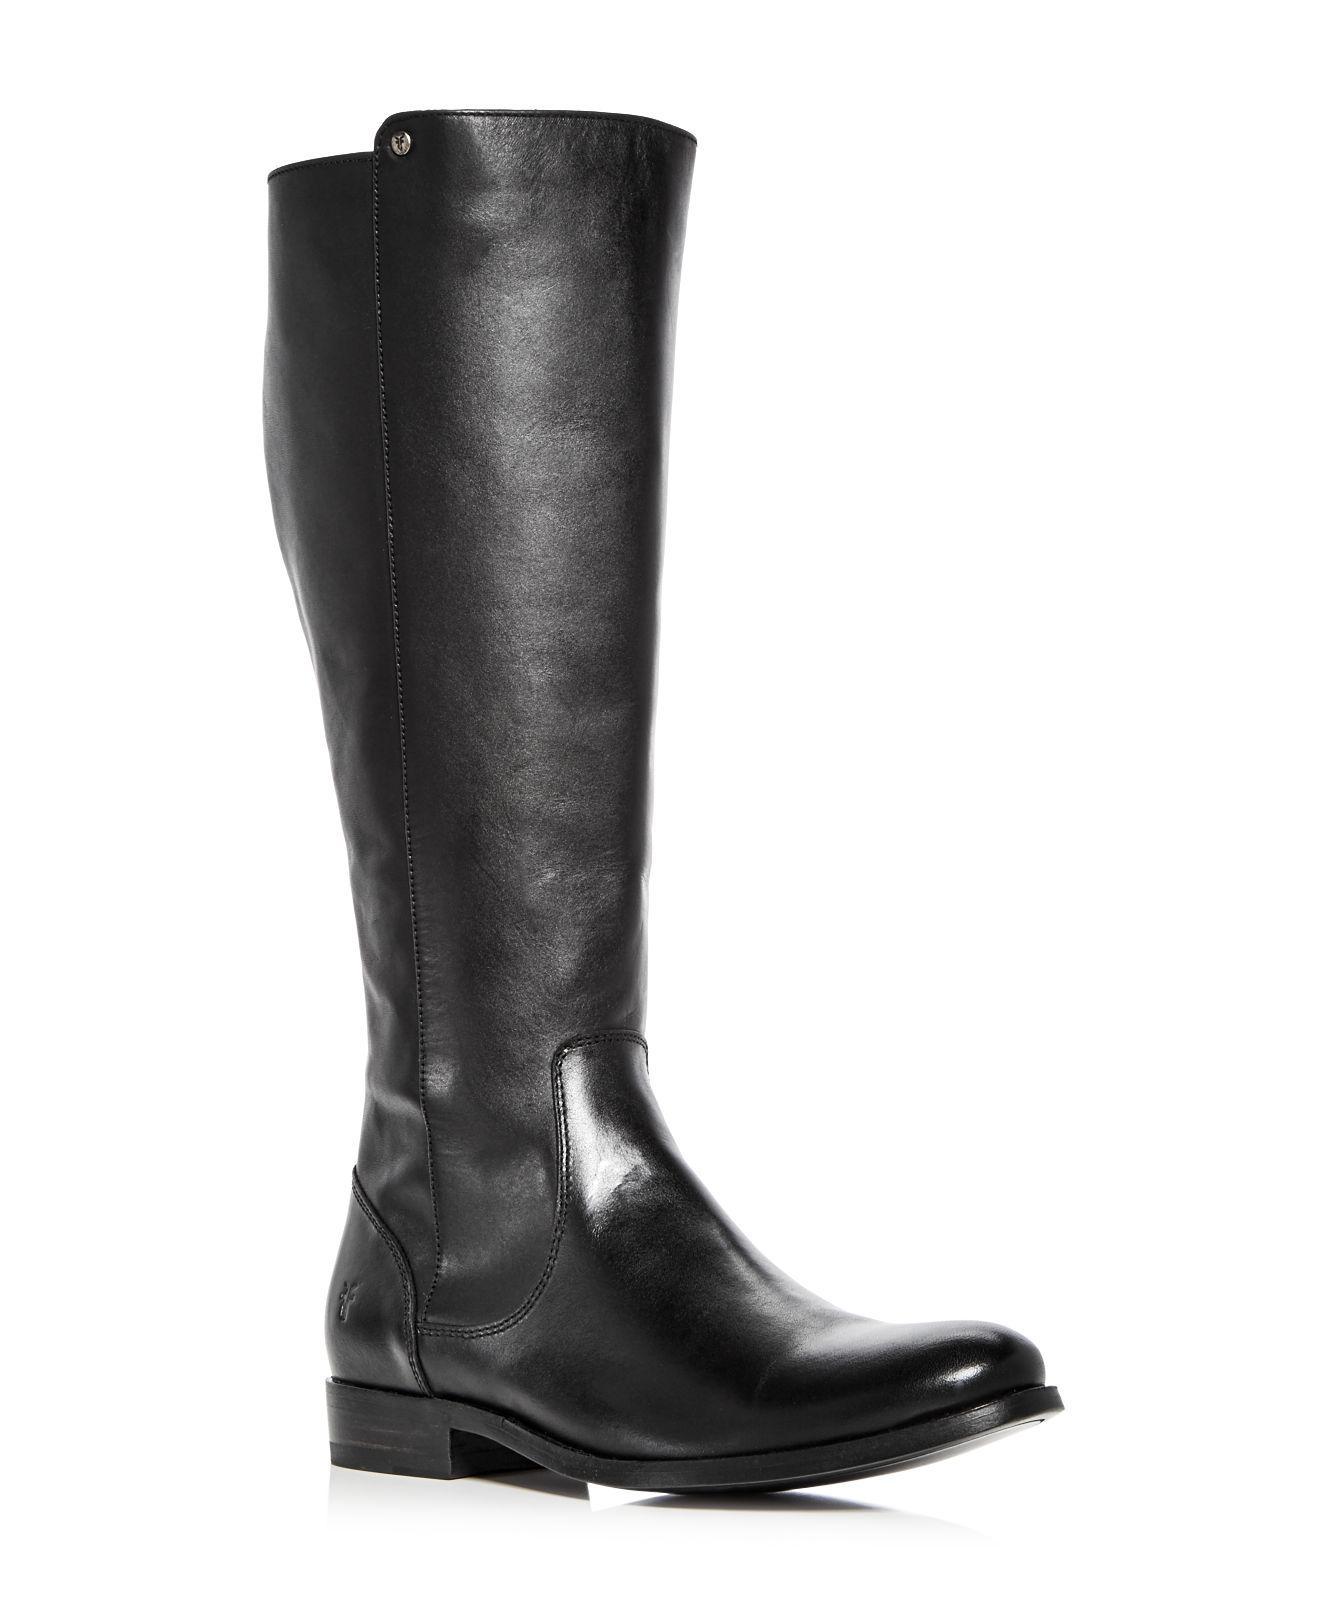 Frye Women's Melissa Stud Knee High Boot ZDlaHSgB